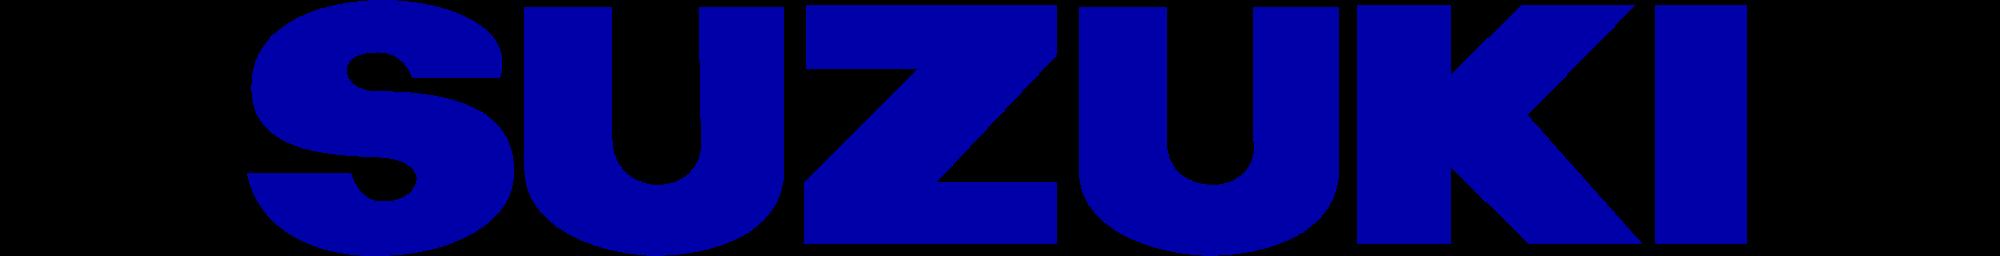 Open PlusPng.com  - Suzuki PNG